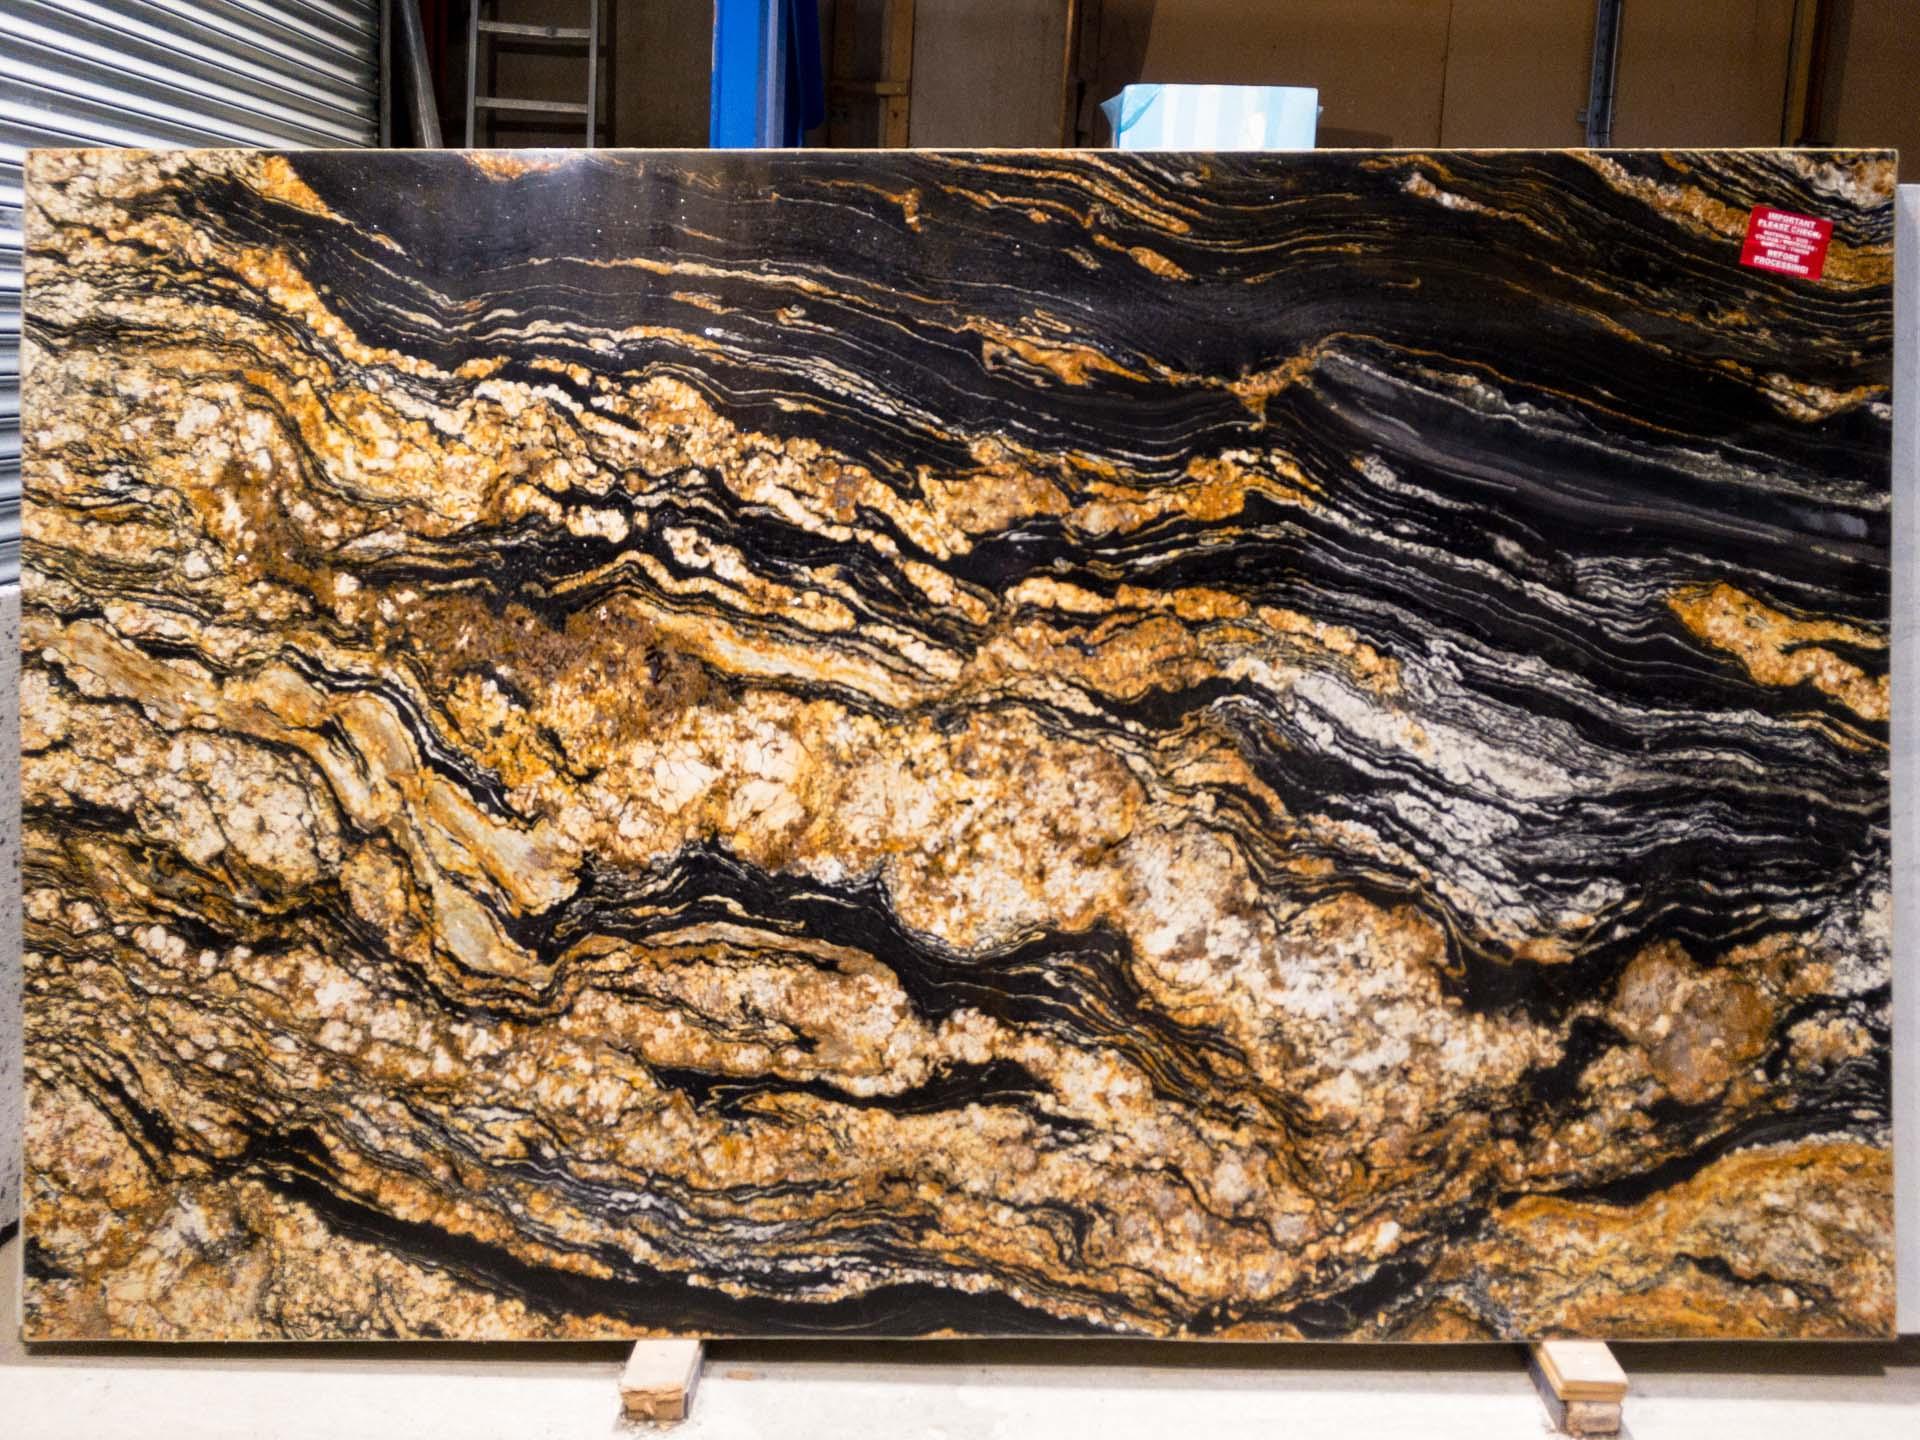 granite and quartz slabs Magma Black Granite GG181004 34093 154821-a